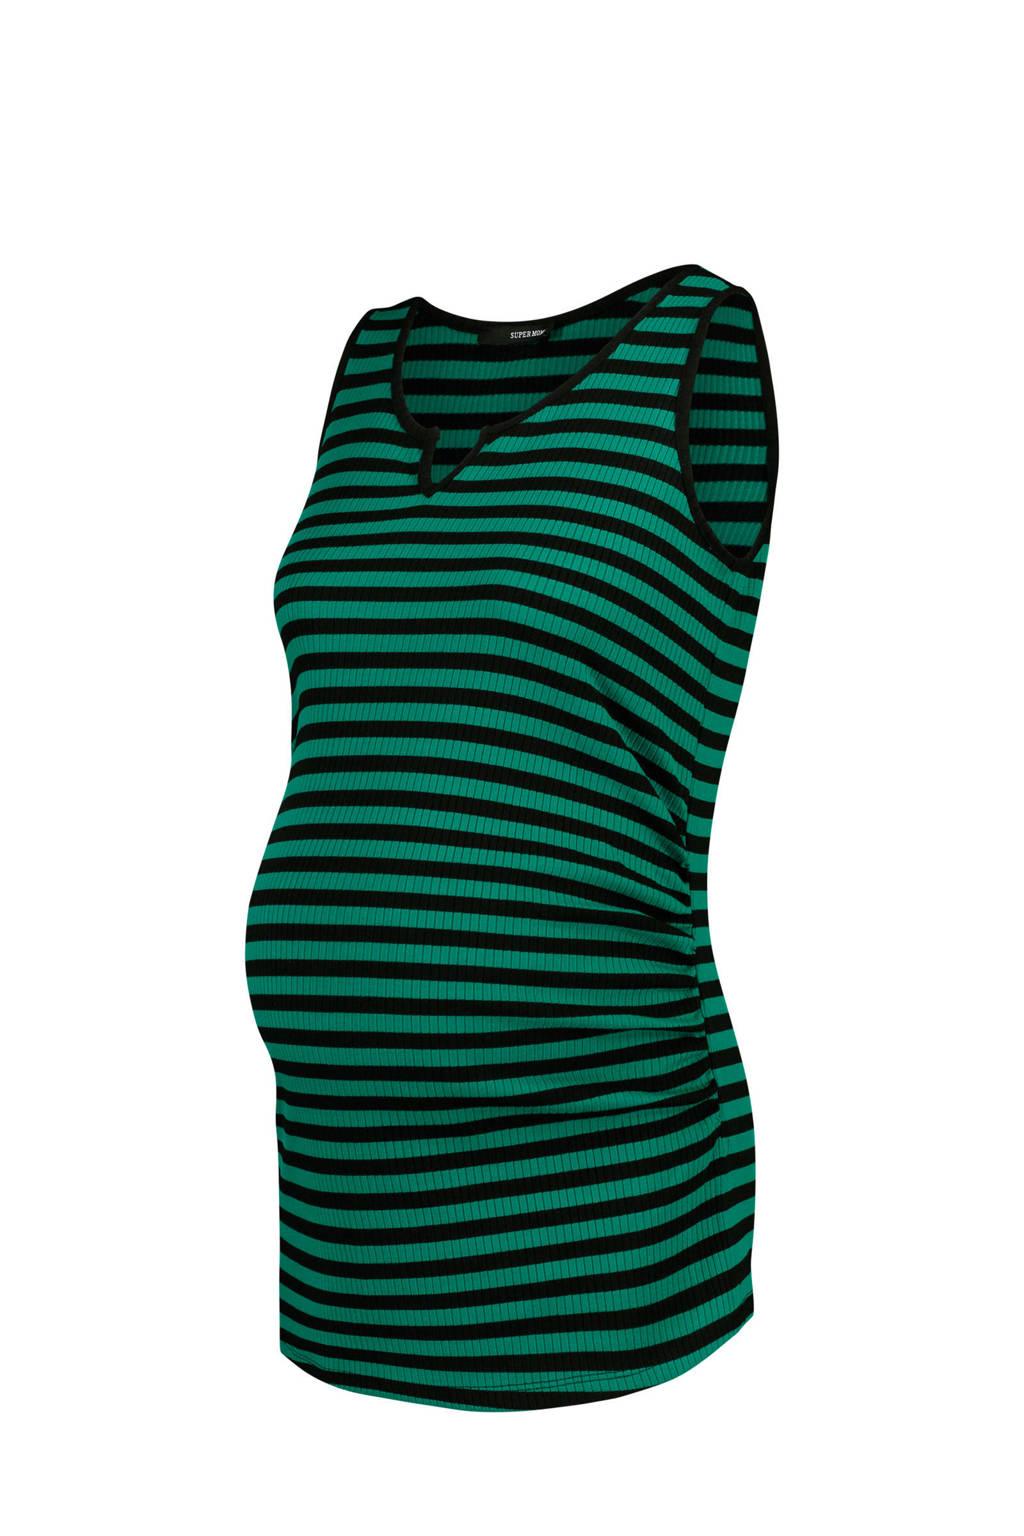 Supermom zwangerschapssinglet Base Stripe groen, Cadmium Green Stripe-P182